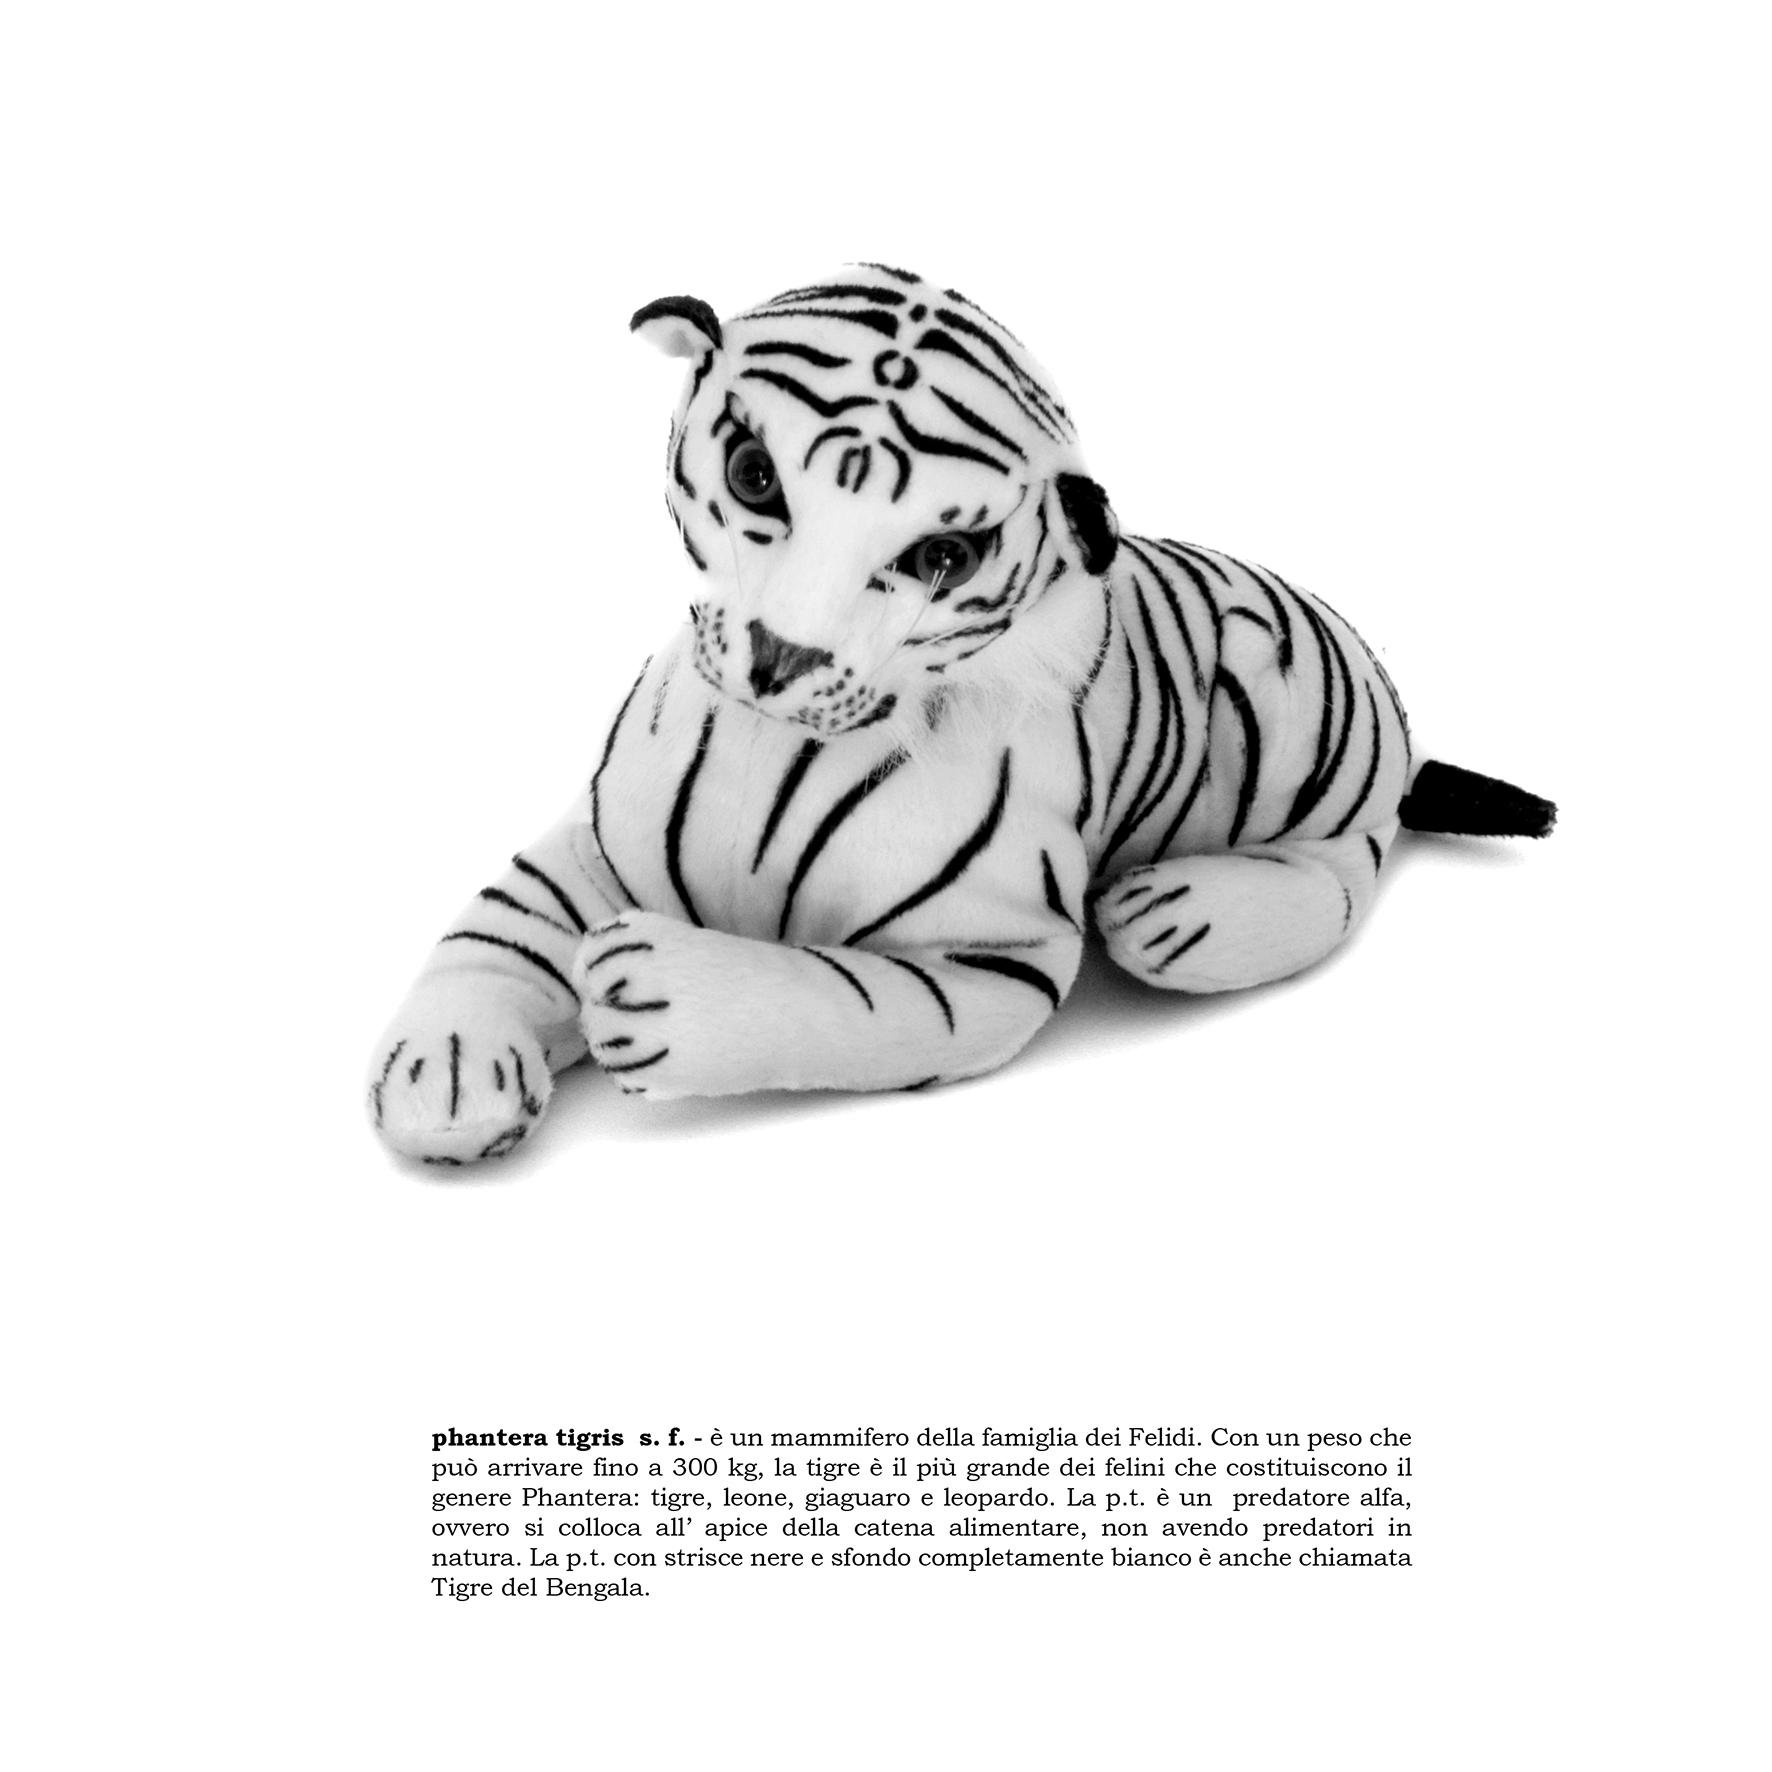 phantera tigris